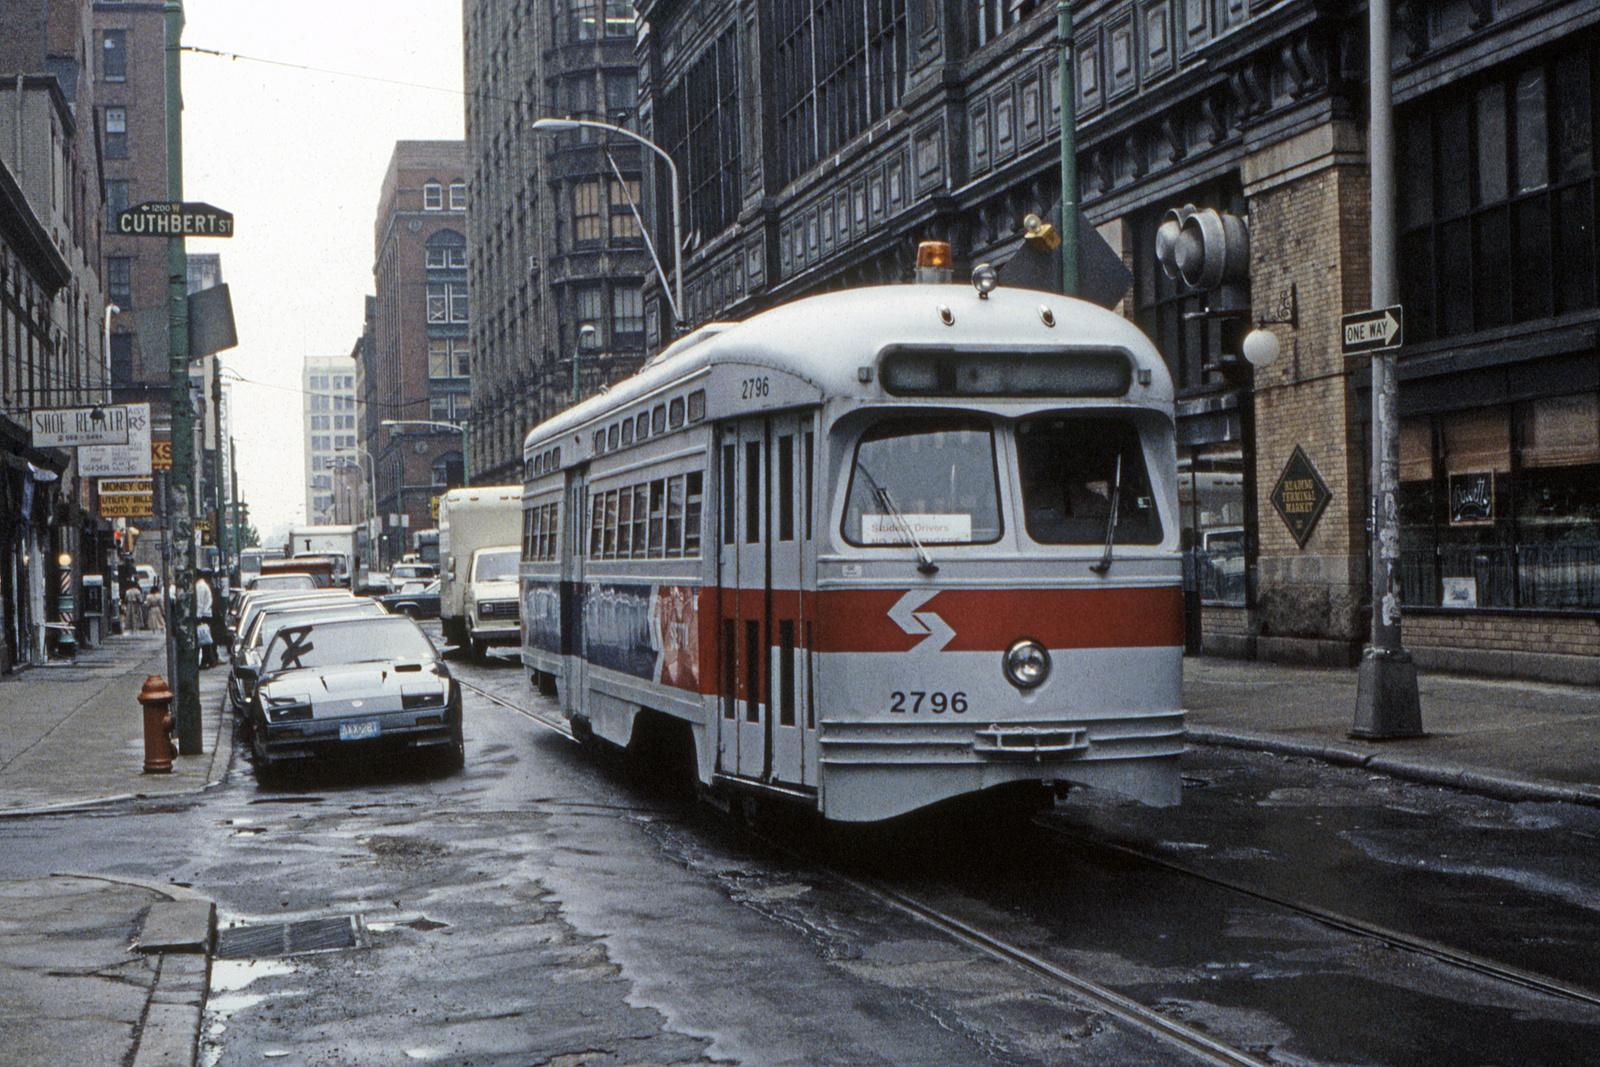 (1088k, 1600x1067)<br><b>Country:</b> United States<br><b>City:</b> Philadelphia, PA<br><b>System:</b> SEPTA (or Predecessor)<br><b>Line:</b> Rt. 23-Germantown<br><b>Location:</b> 12th/Cuthbert<br><b>Car:</b> PTC/SEPTA Postwar All-electric PCC (St.Louis, 1947) 2796 <br><b>Collection of:</b> David Pirmann<br><b>Date:</b> 5/1988<br><b>Viewed (this week/total):</b> 1 / 109